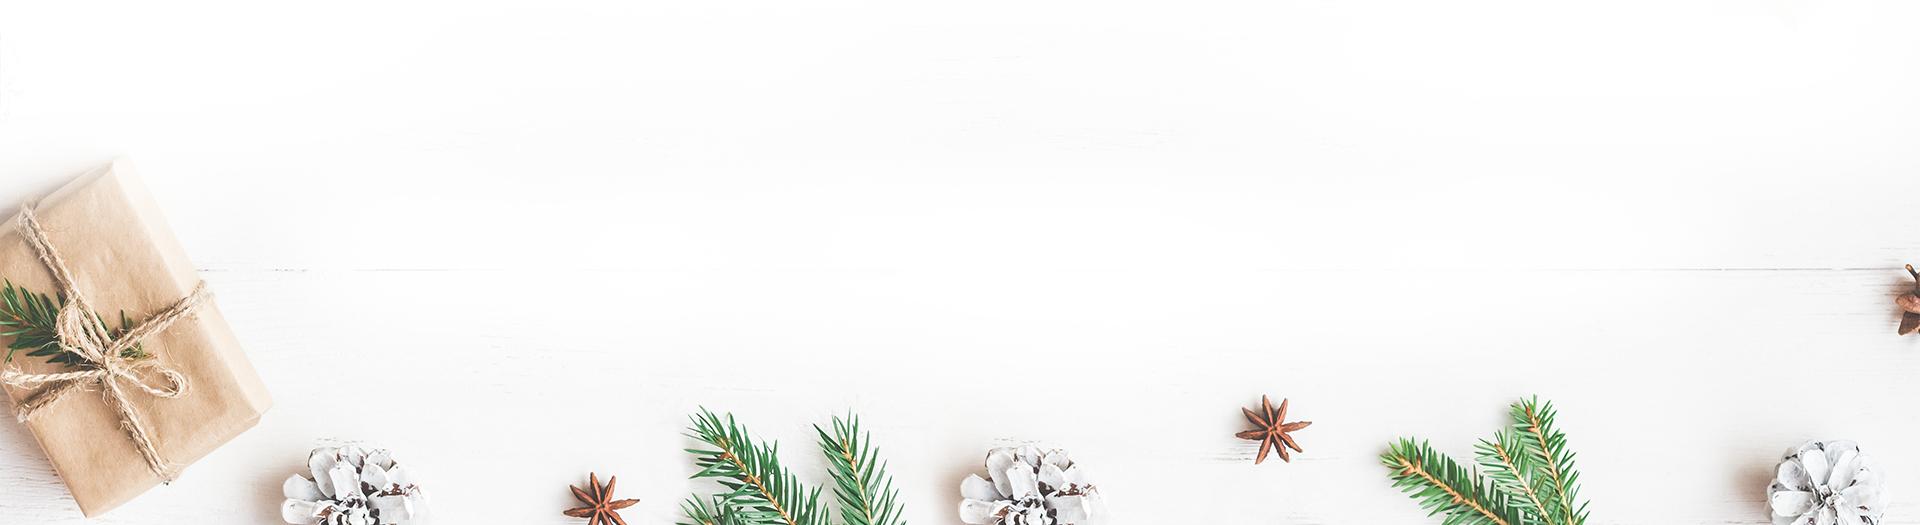 1_Holiday_Gift_Guide_Coordinator_Landing_Page_Banner_102218_1920_V2